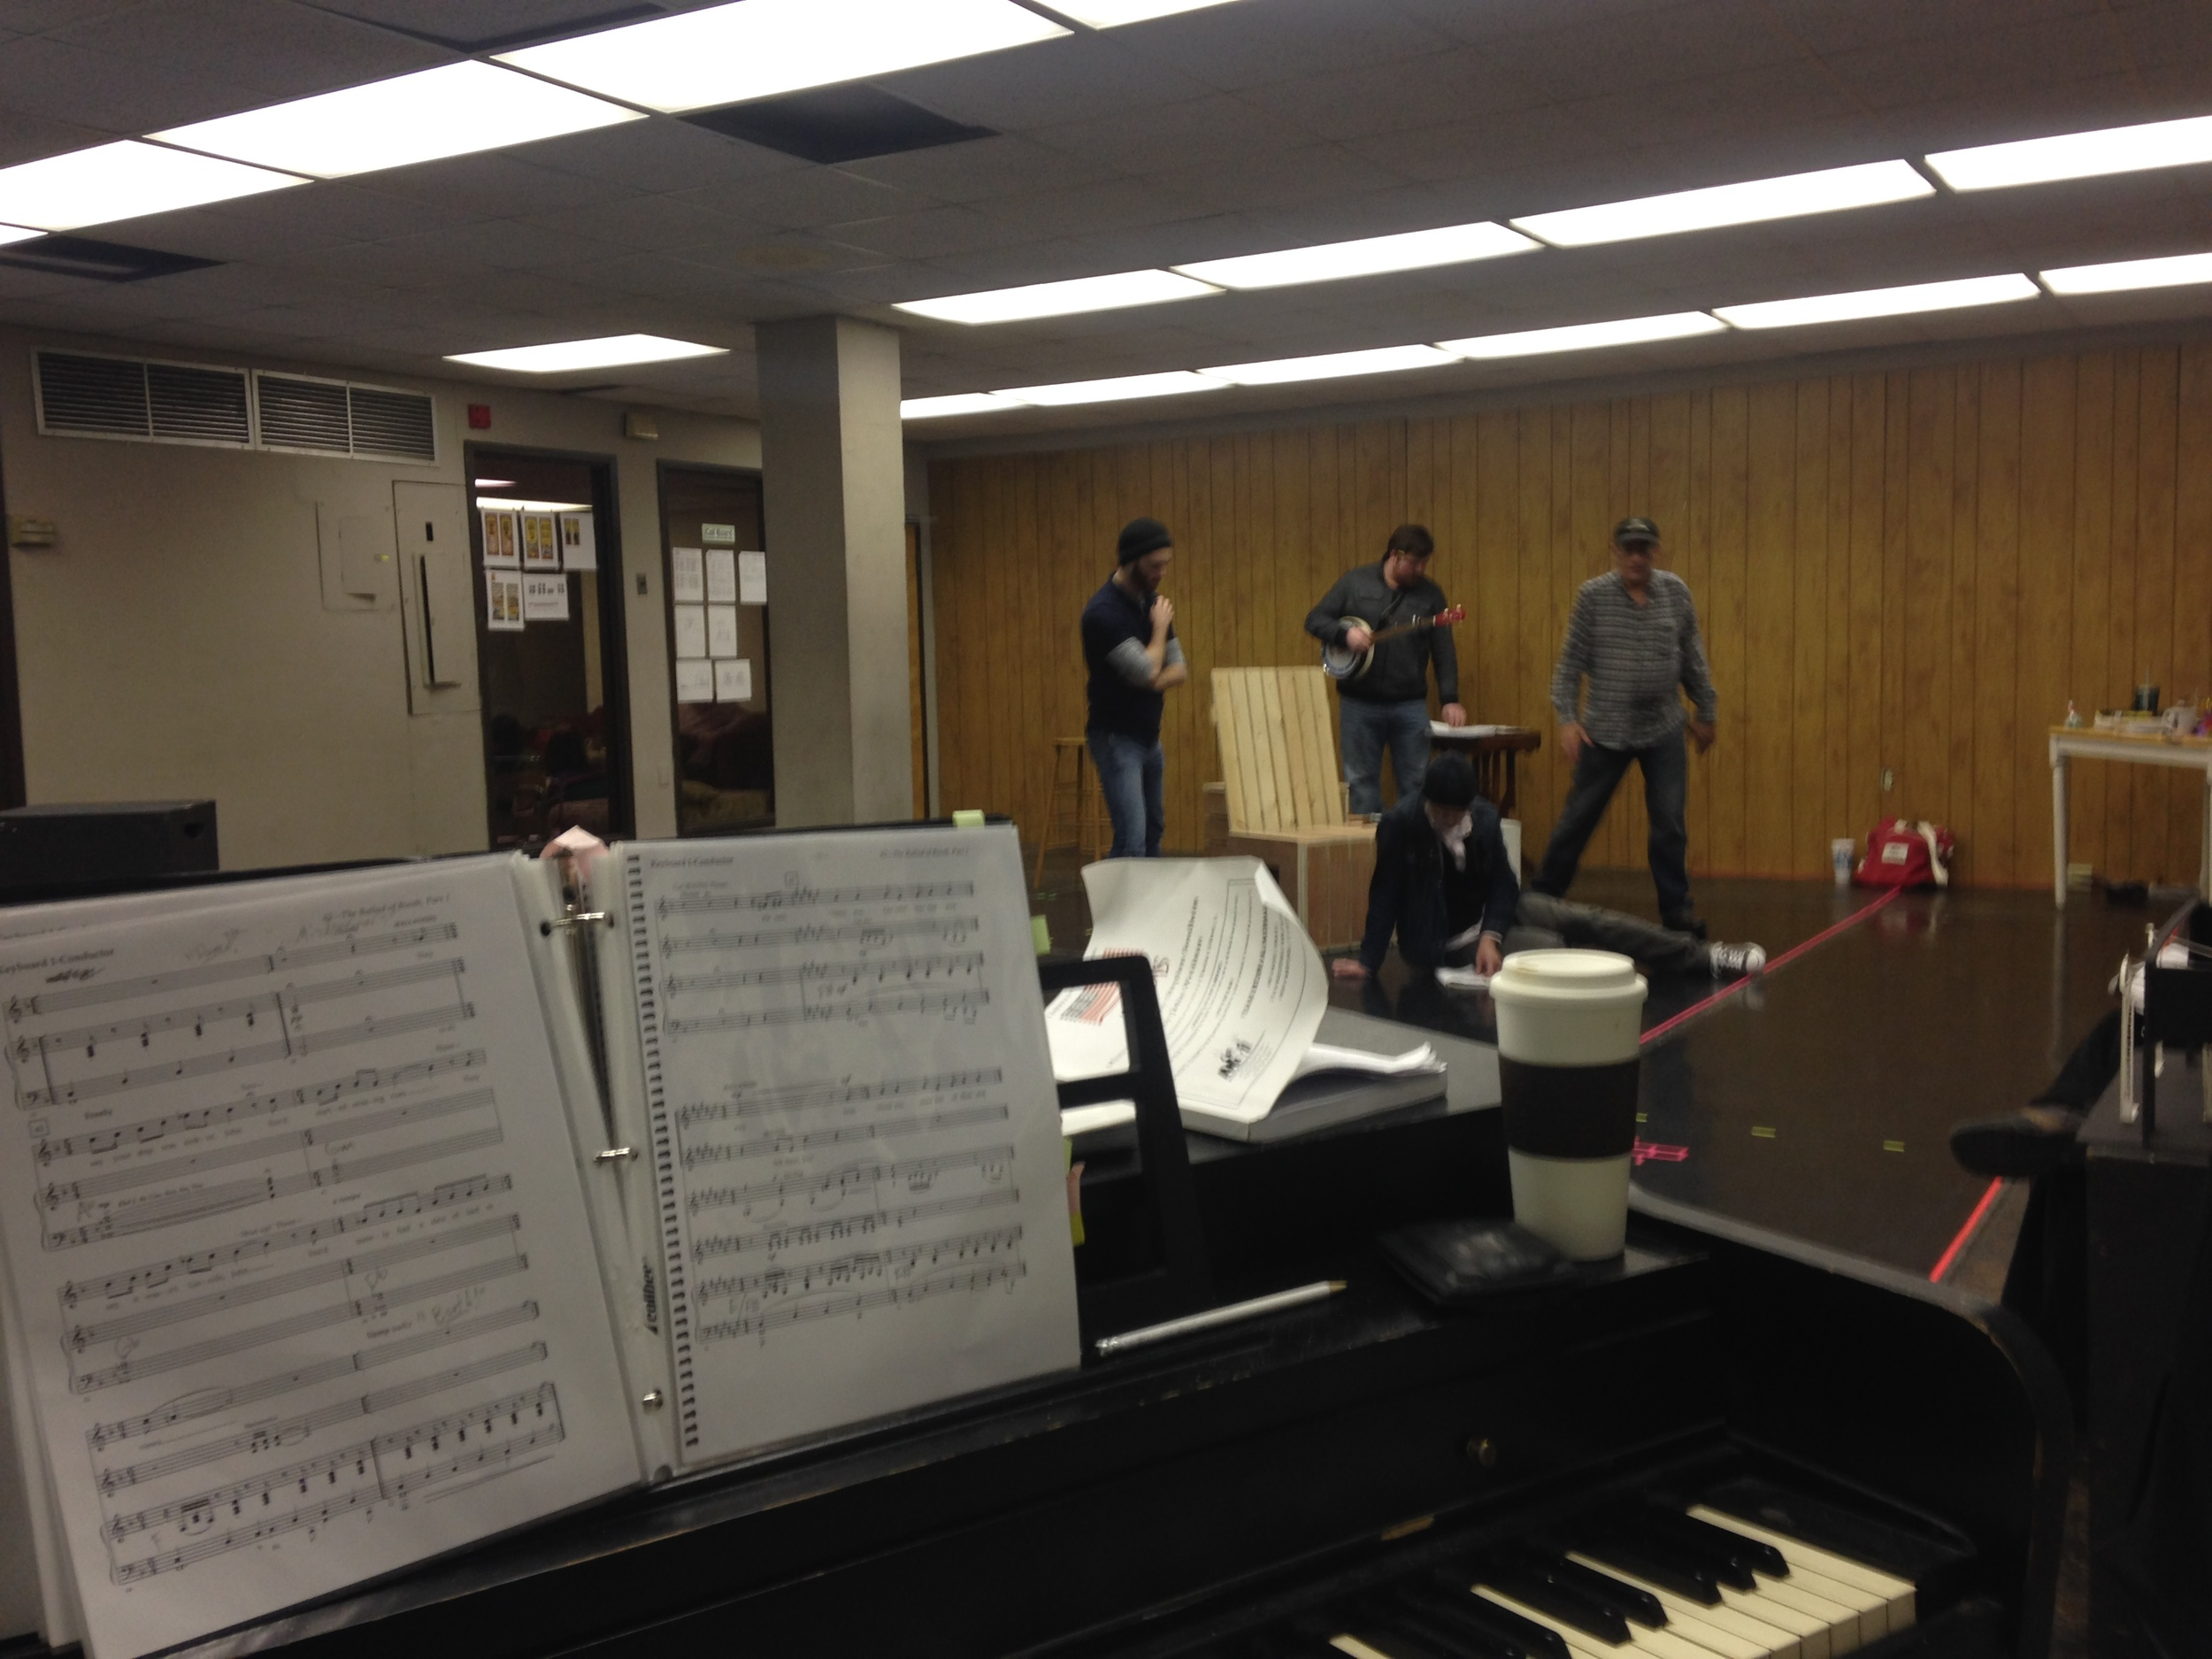 Rehearsal battle station, Assassins